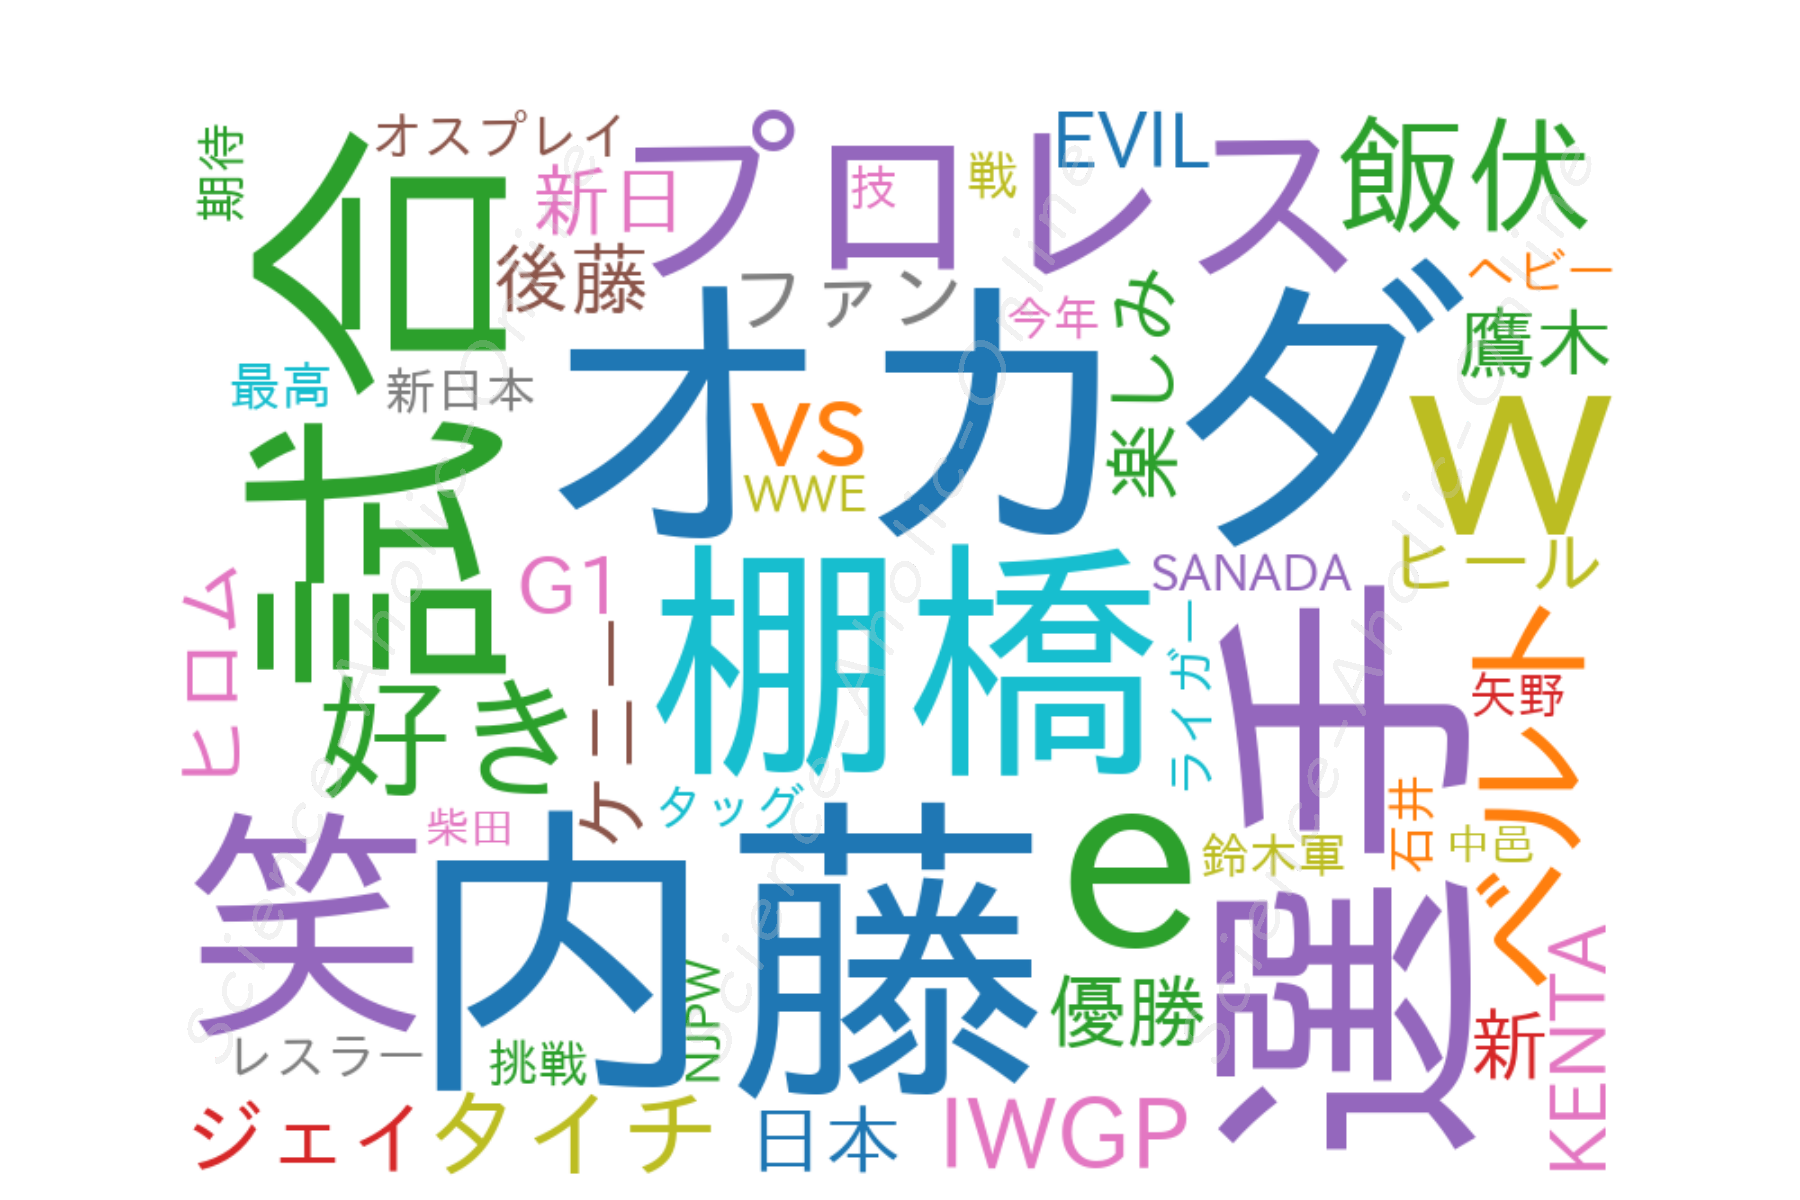 https://science-aholic-online.com/wp-content/uploads/2020/08/wordcloud_新日本プロレスリング株式会社.png